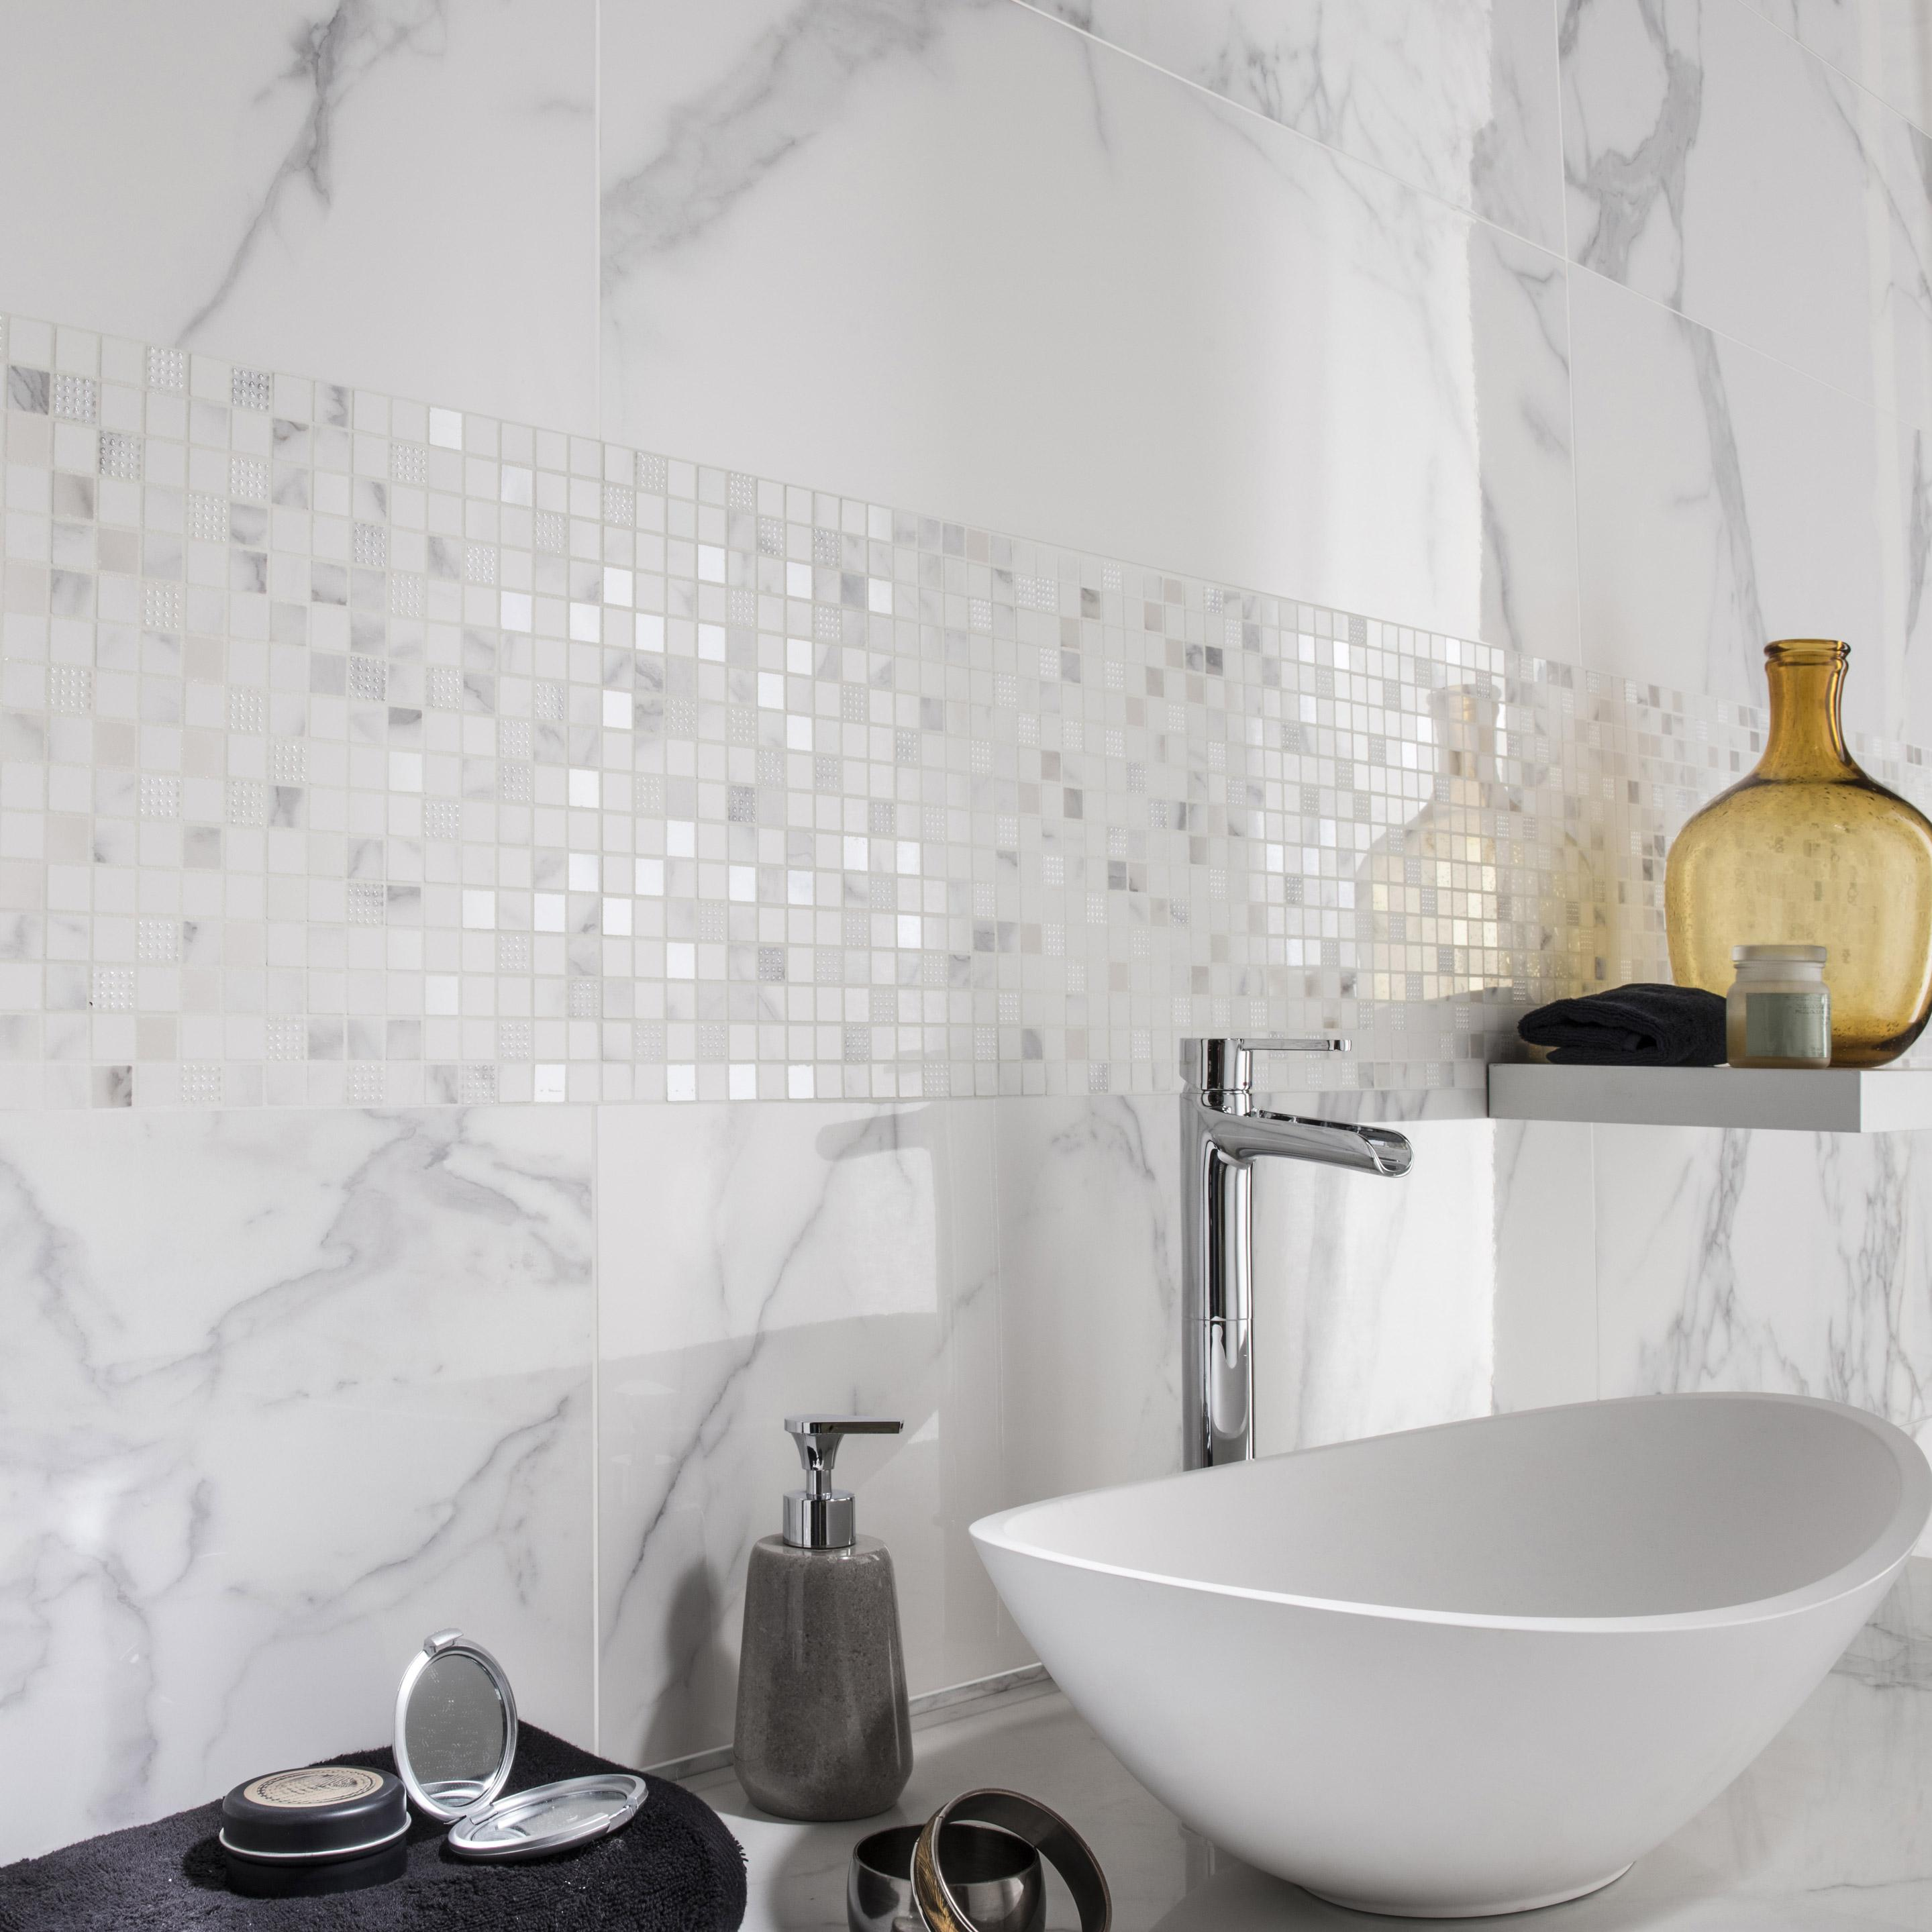 Faïence mur marbre blanc carrare brillant l.30.5 x L.91.5 cm, Murano